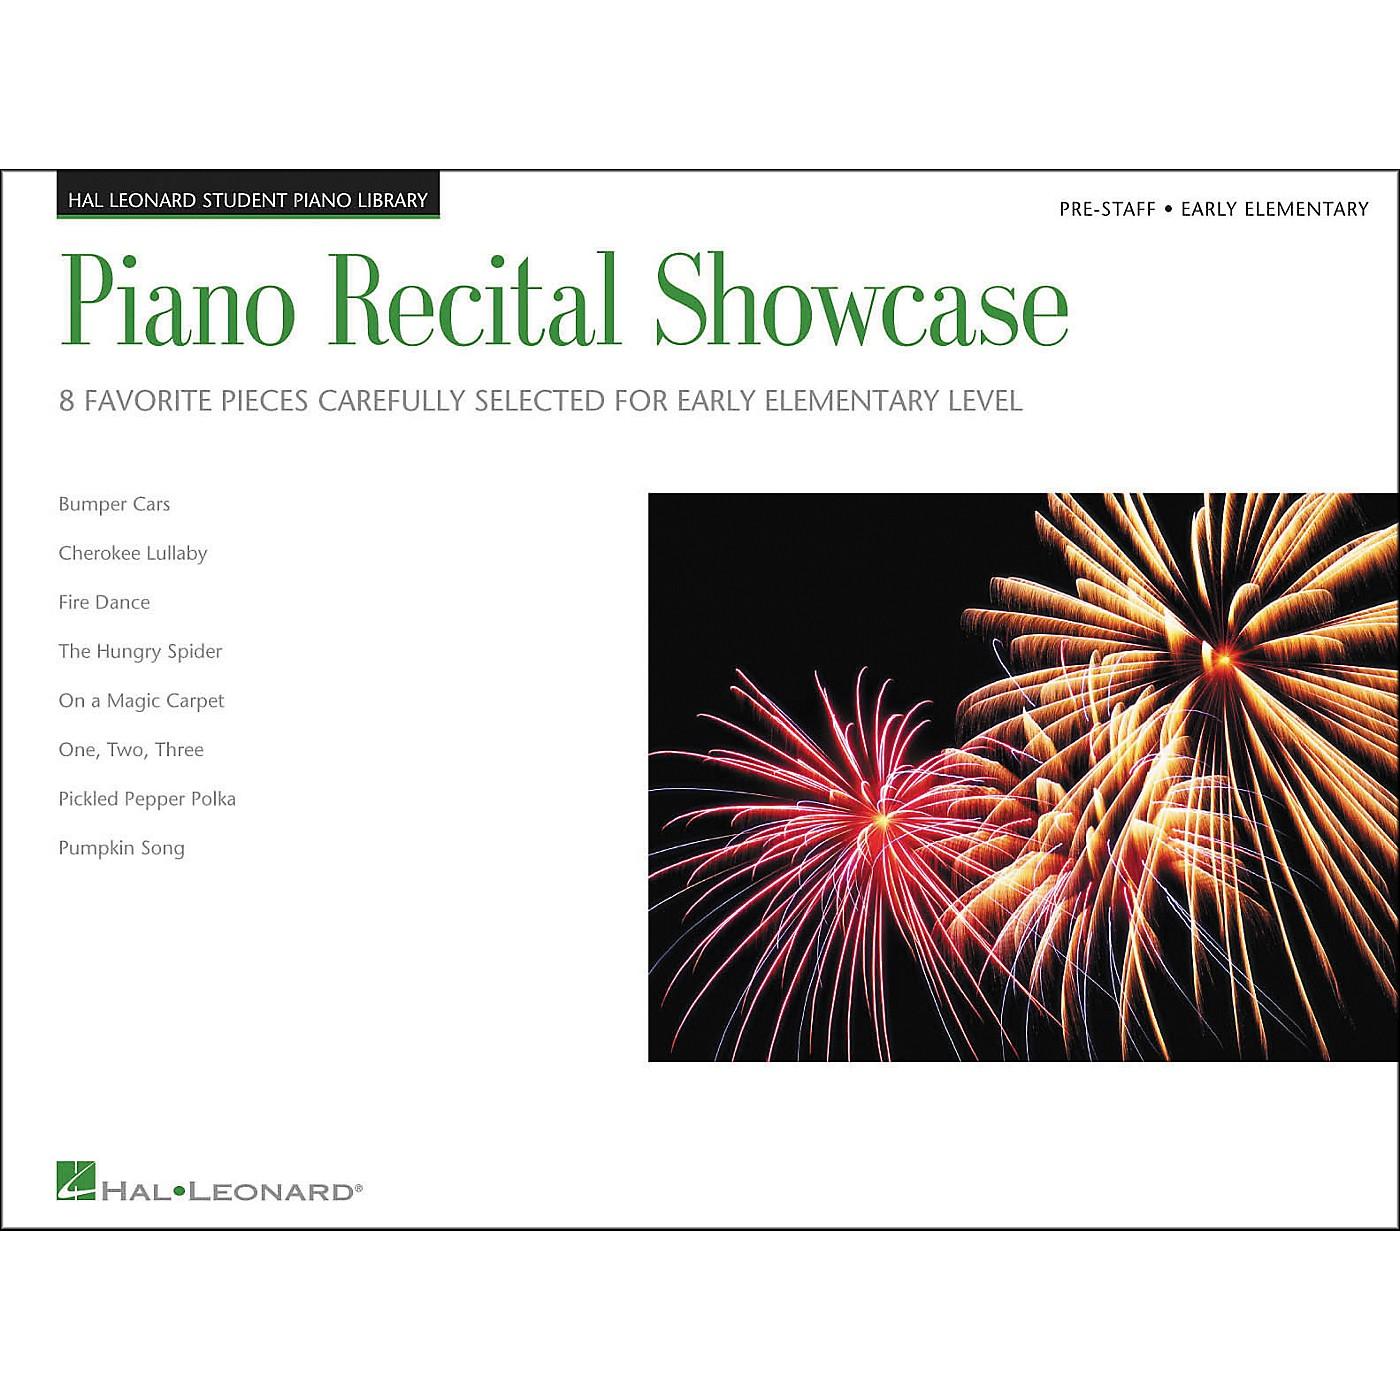 Hal Leonard Piano Recital Showcase Early Elementary Pre-Staff Level Hal Leonard Student Piano Library thumbnail